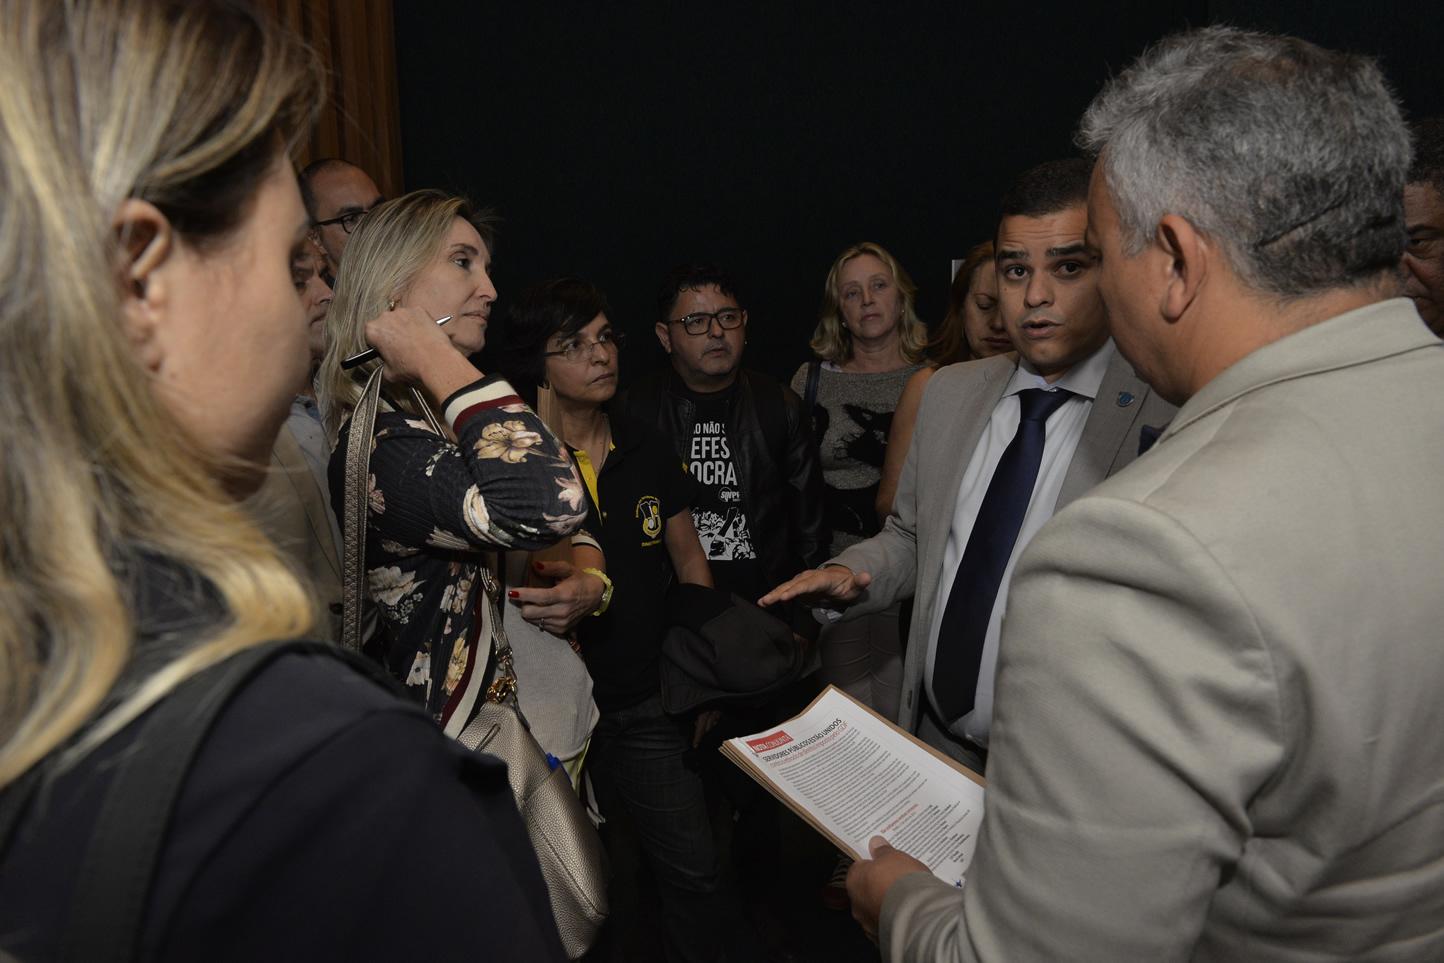 2019.06.13_Visita-aos-gabinetes-contra-o-fim-da-licenca-premio_fotos-Deva-Garcia-42